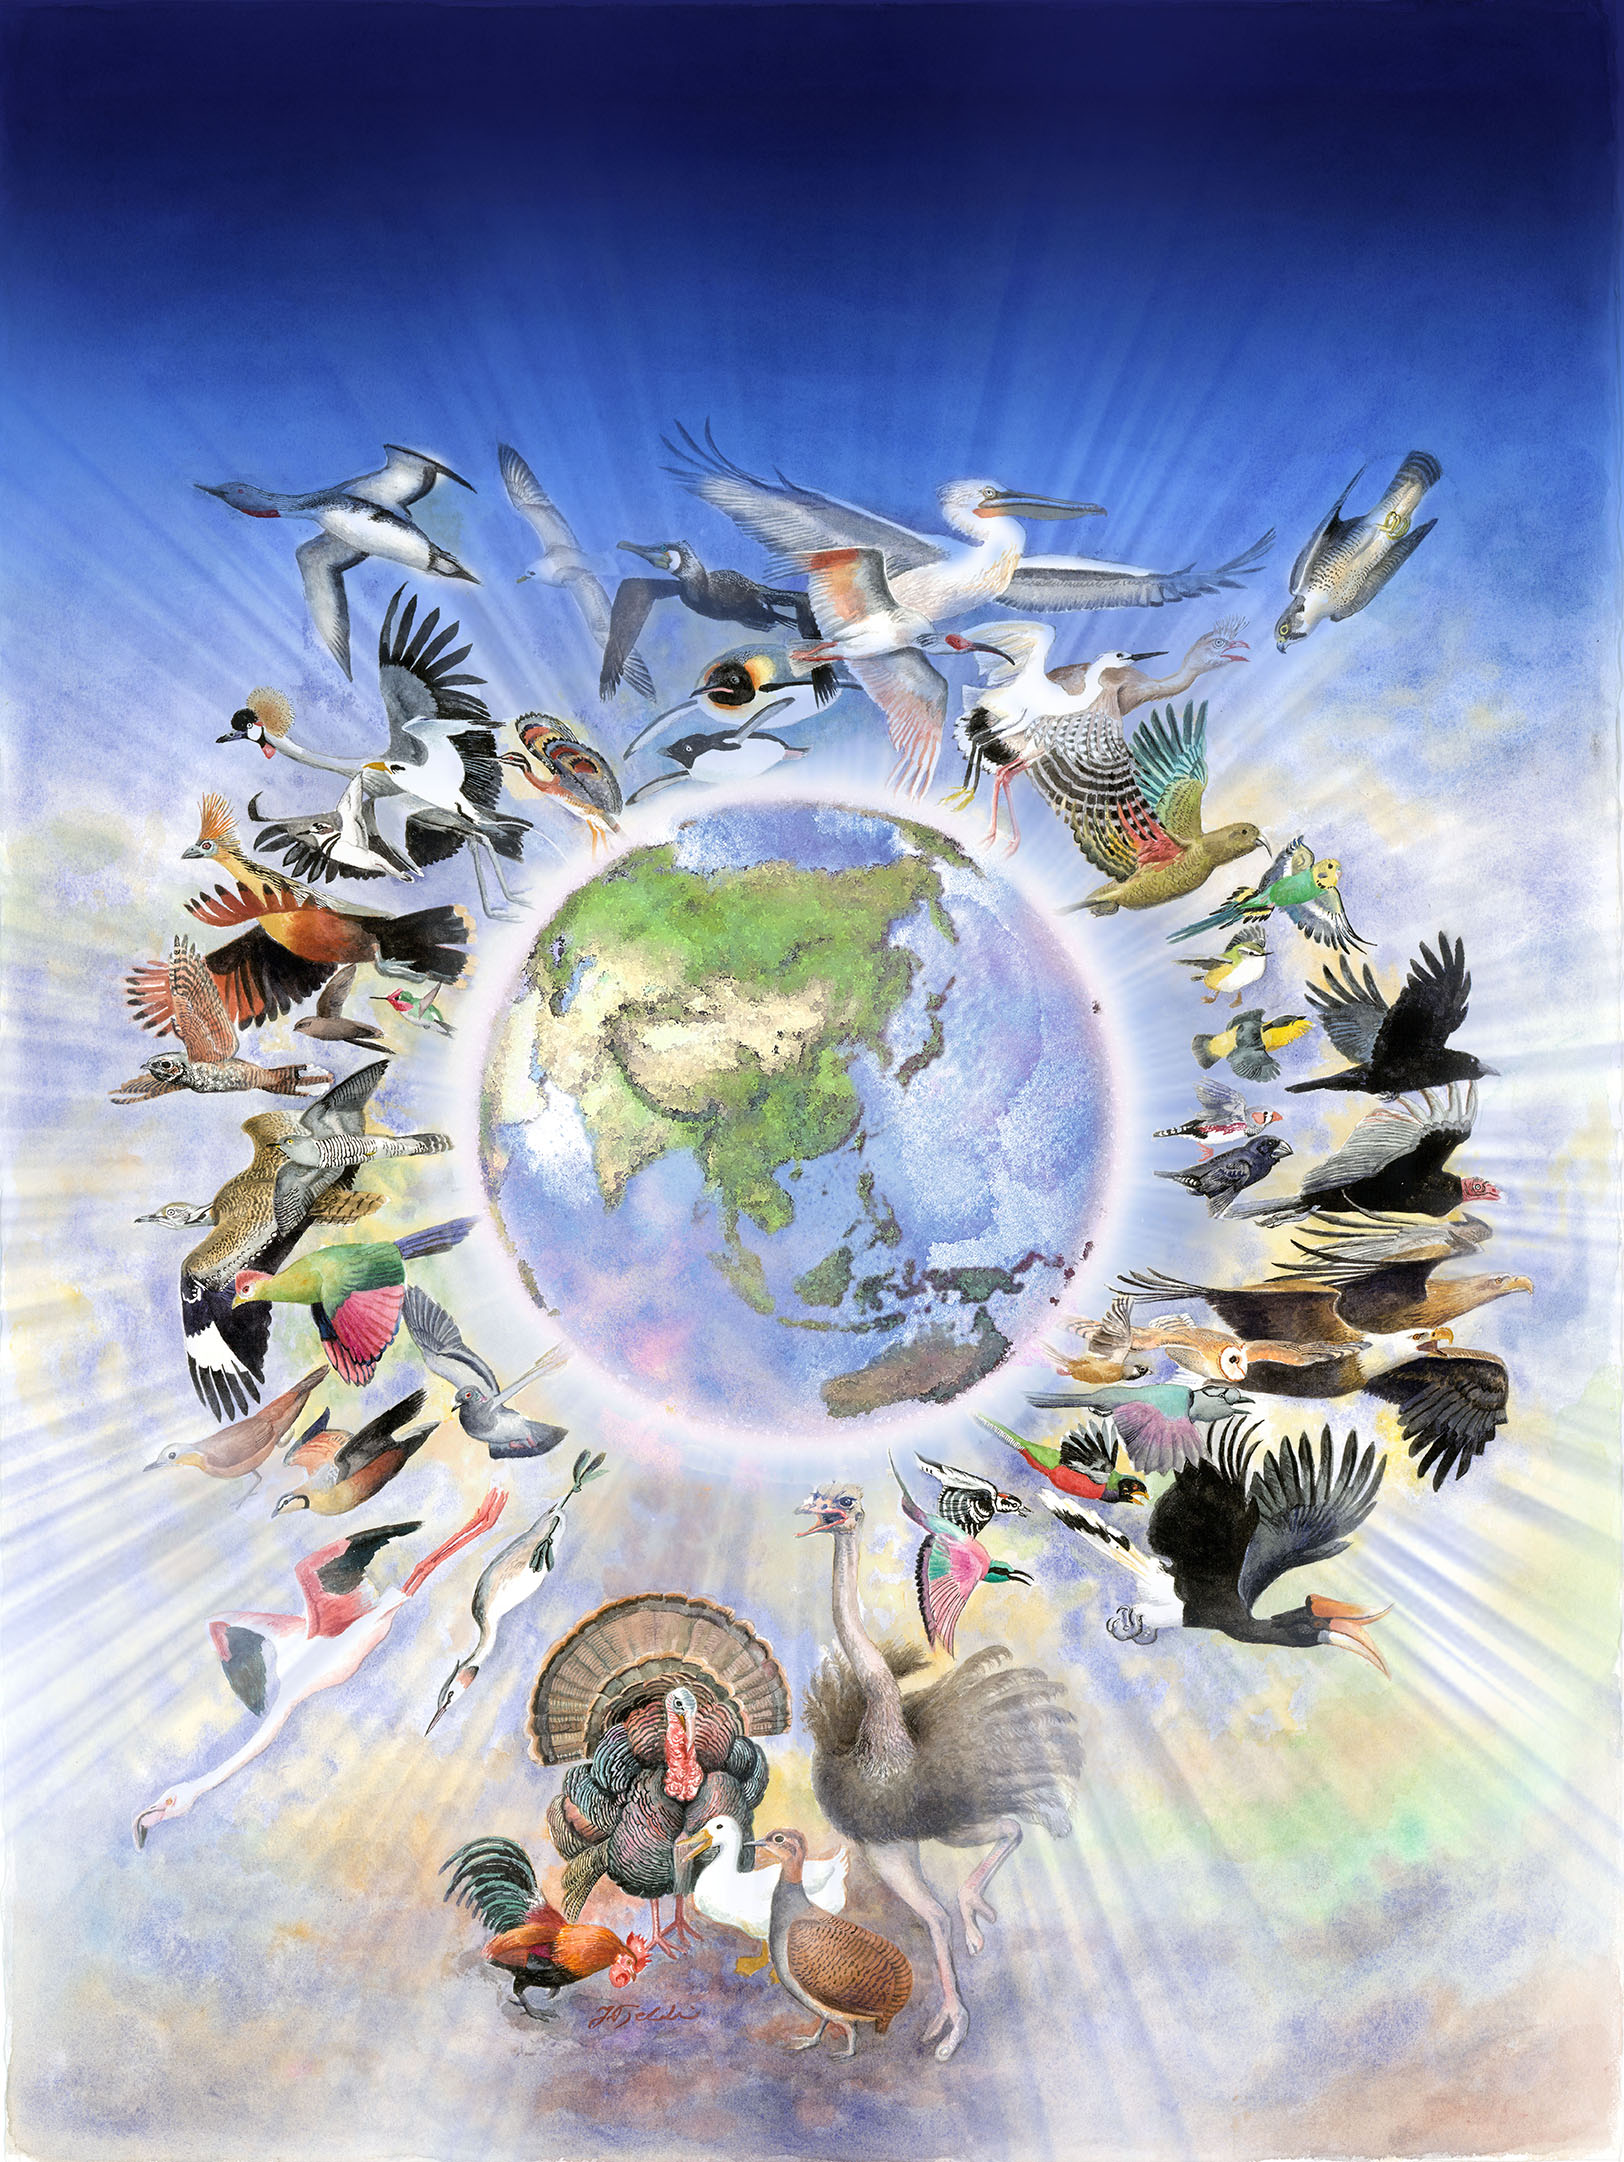 Evolution of birds